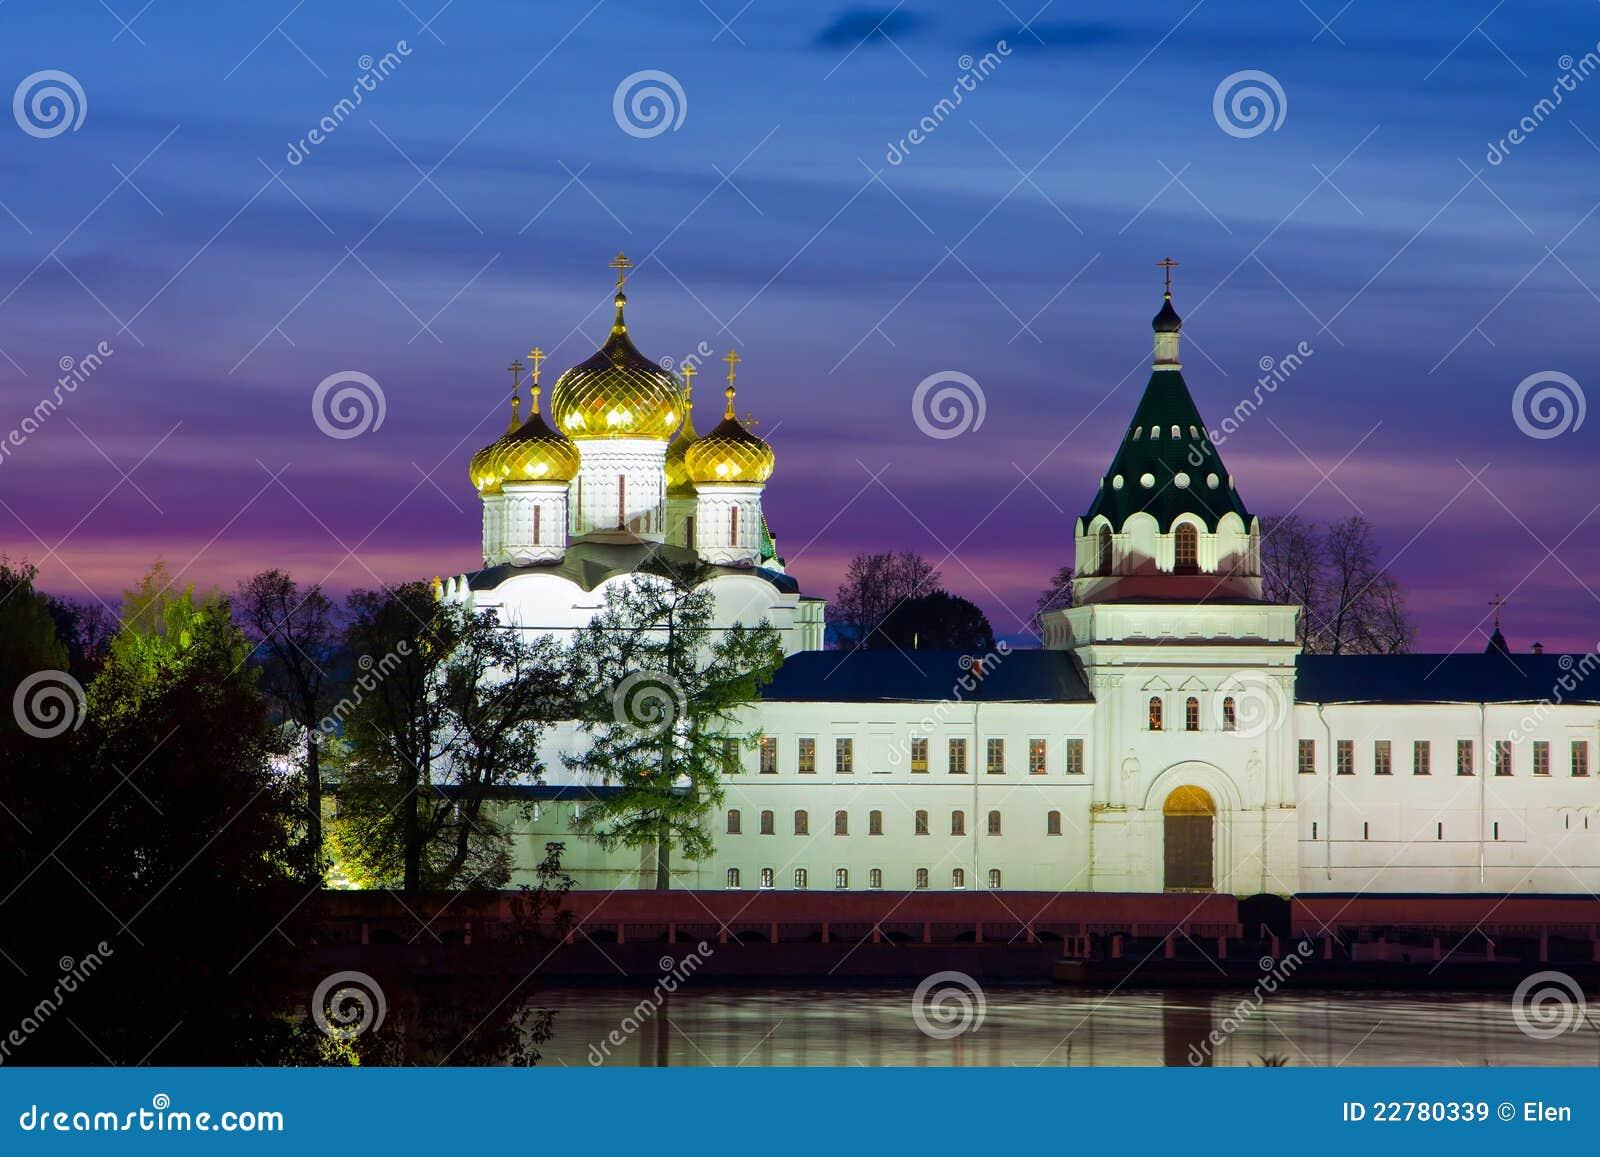 Monastério de Ipatievsky, em Rússia, Kostroma. Noite